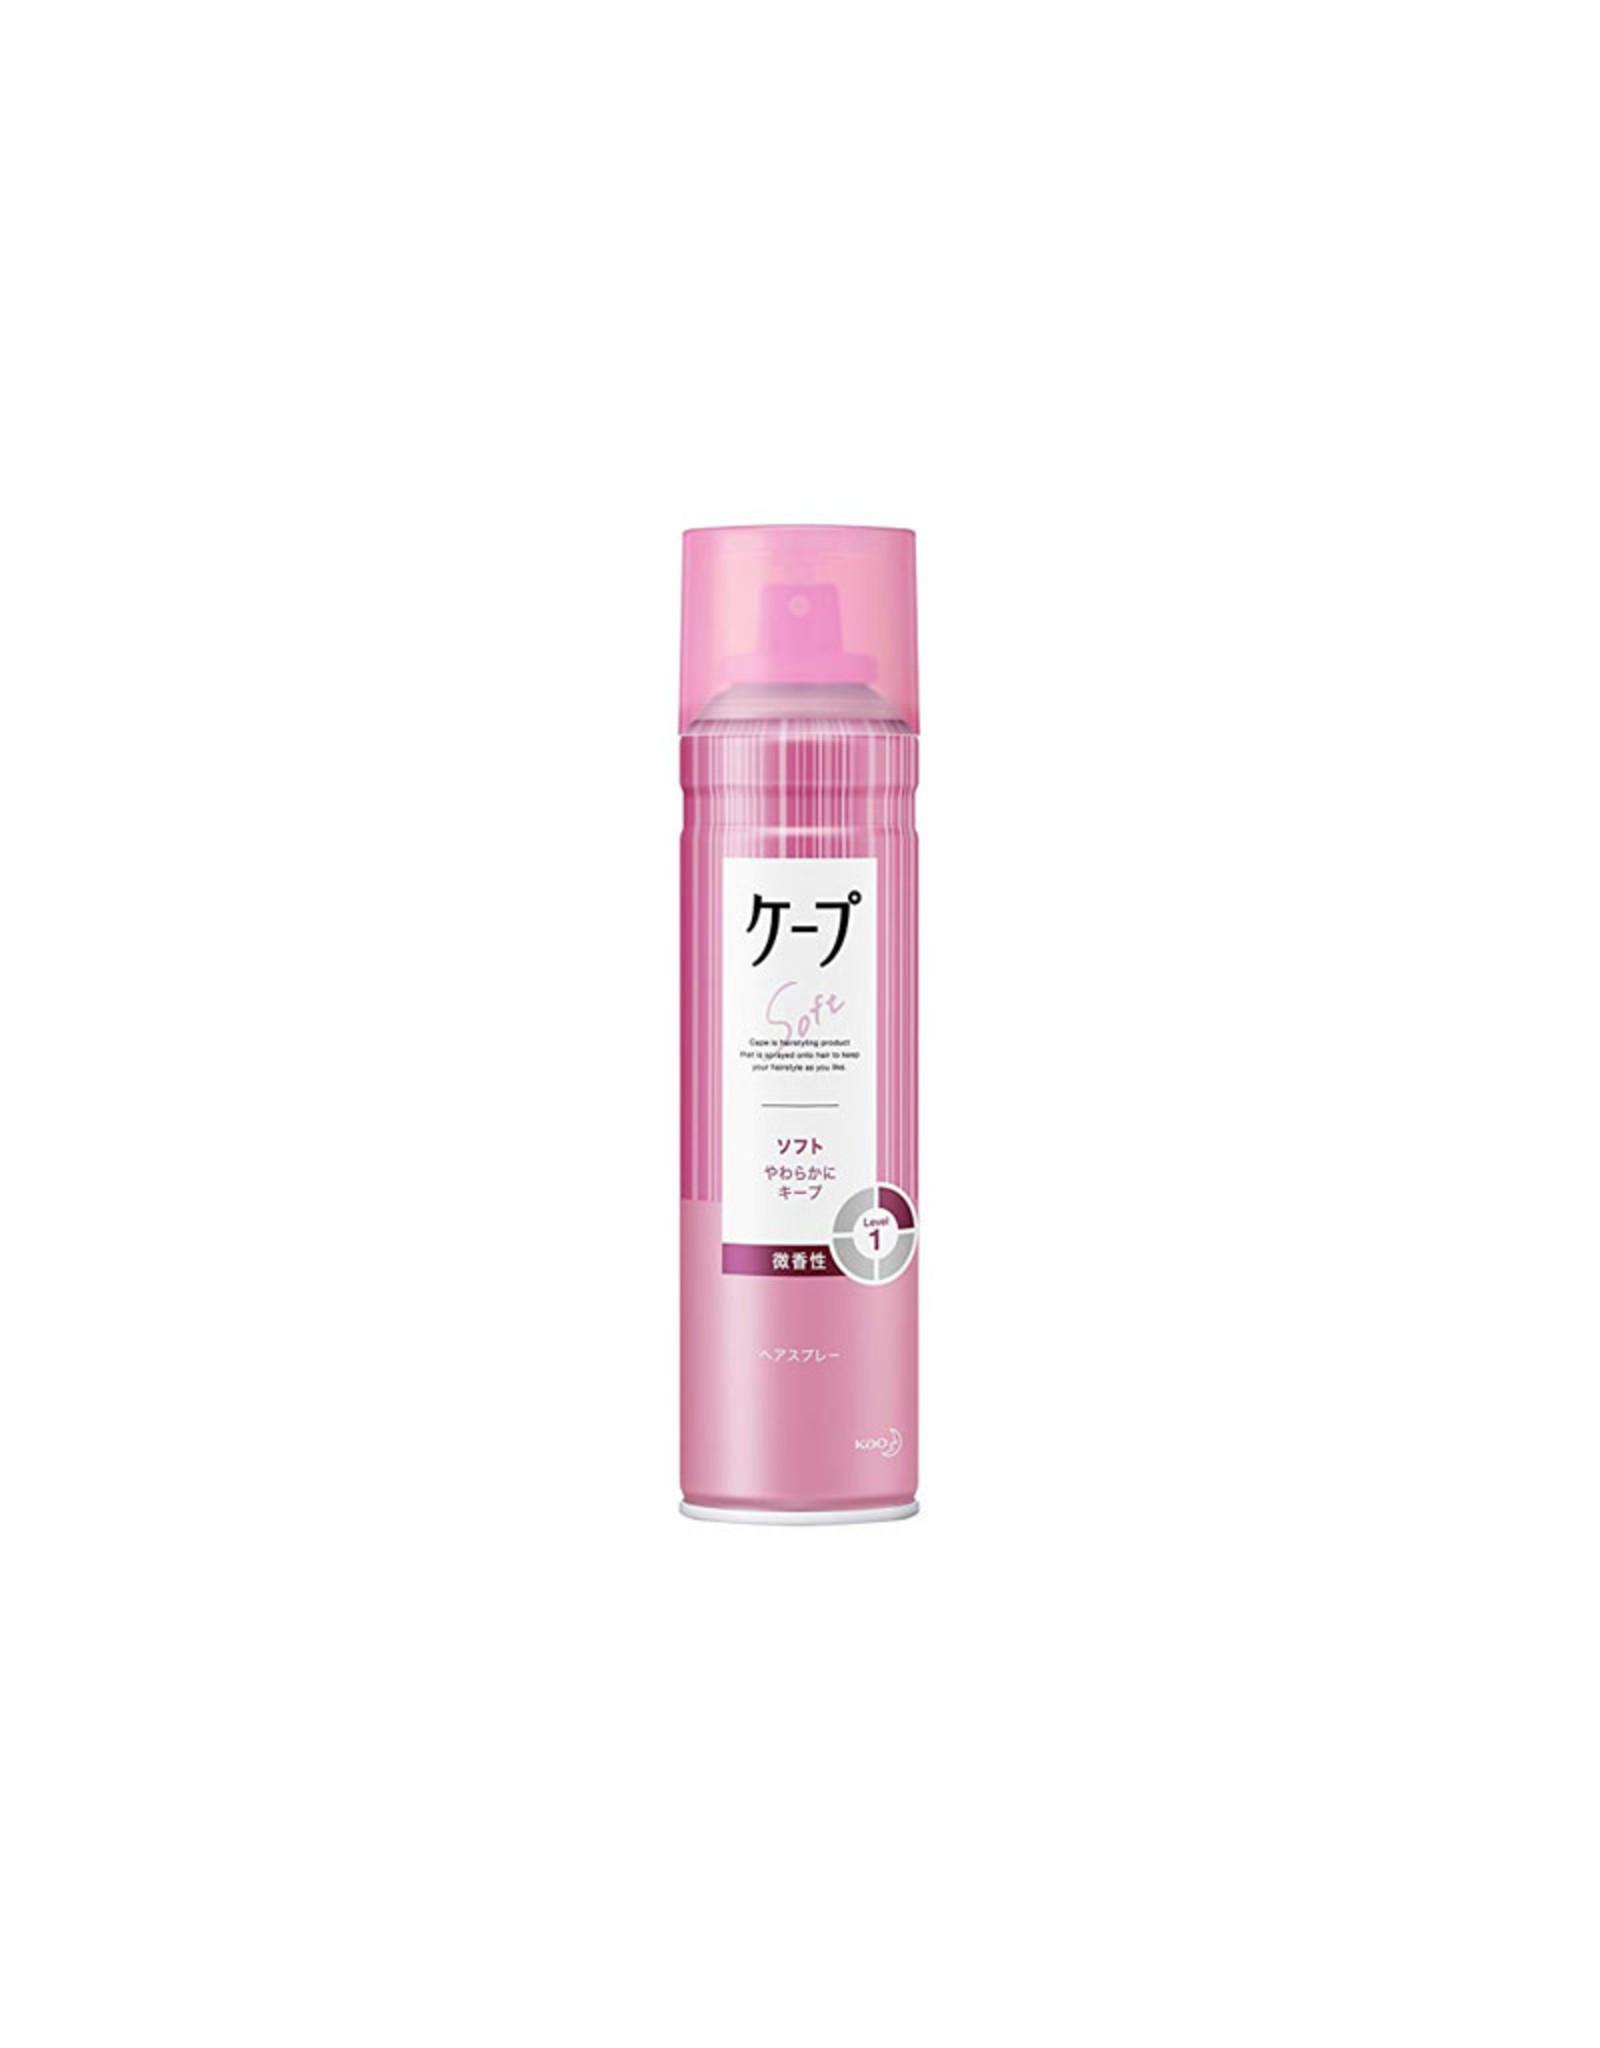 Kao Cape 3D Extra Keep Hair Spray - Light Perfumes